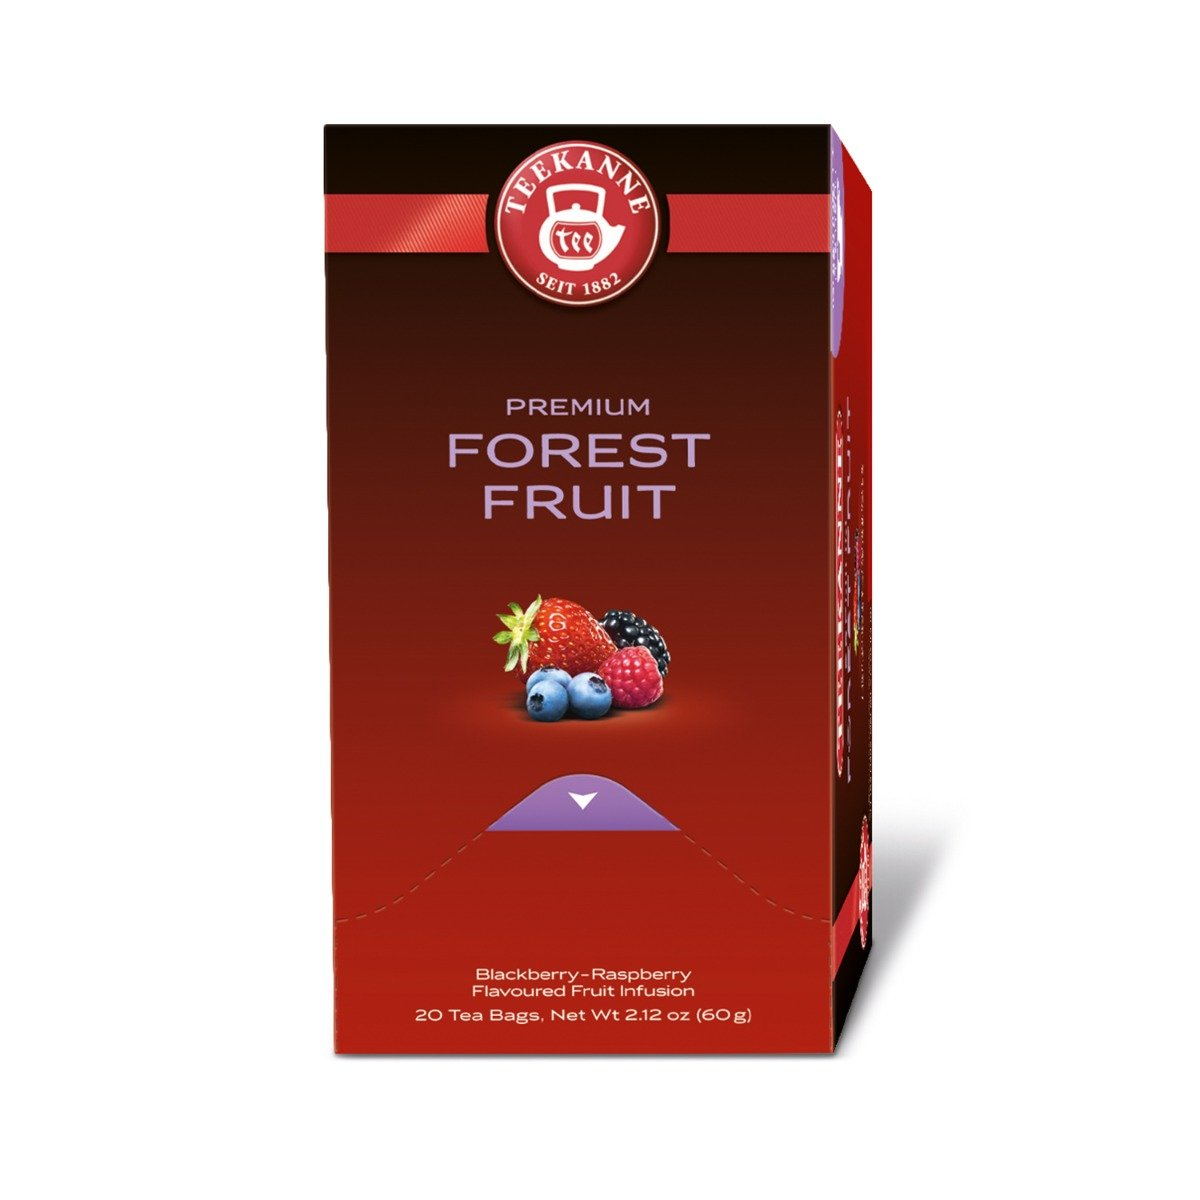 Cutie Ceai Forest Fruit Premium Teekanne, 3g x 20 pliculete imagine